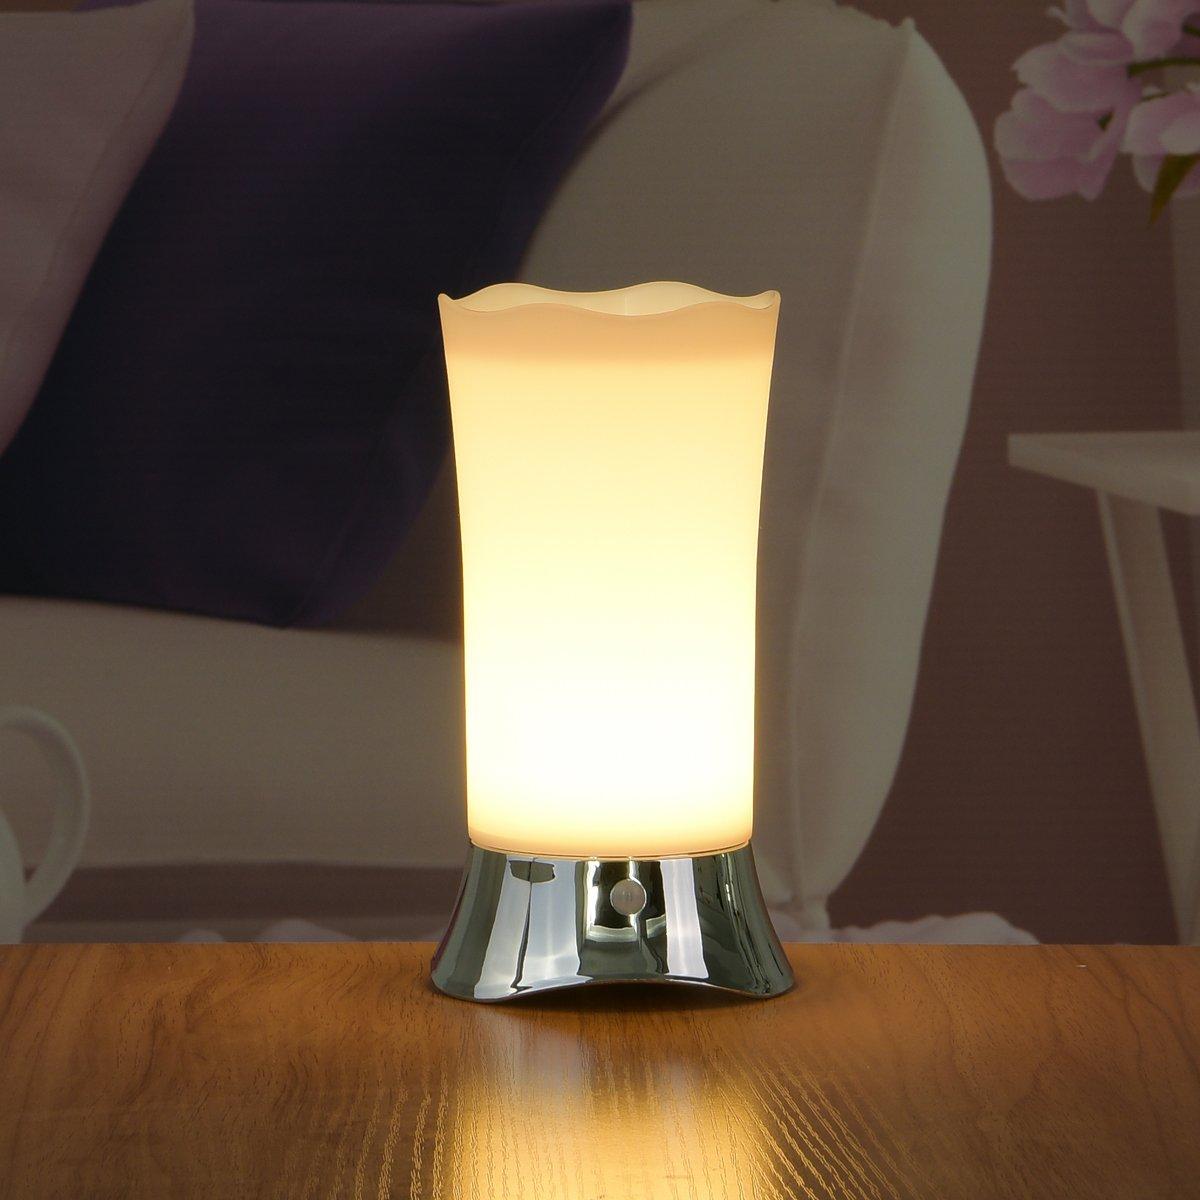 Amazon deeplite night light motion sensor bathroom light zeefo table lamps indoor motion sensor led night light portable retro battery powered light mozeypictures Choice Image